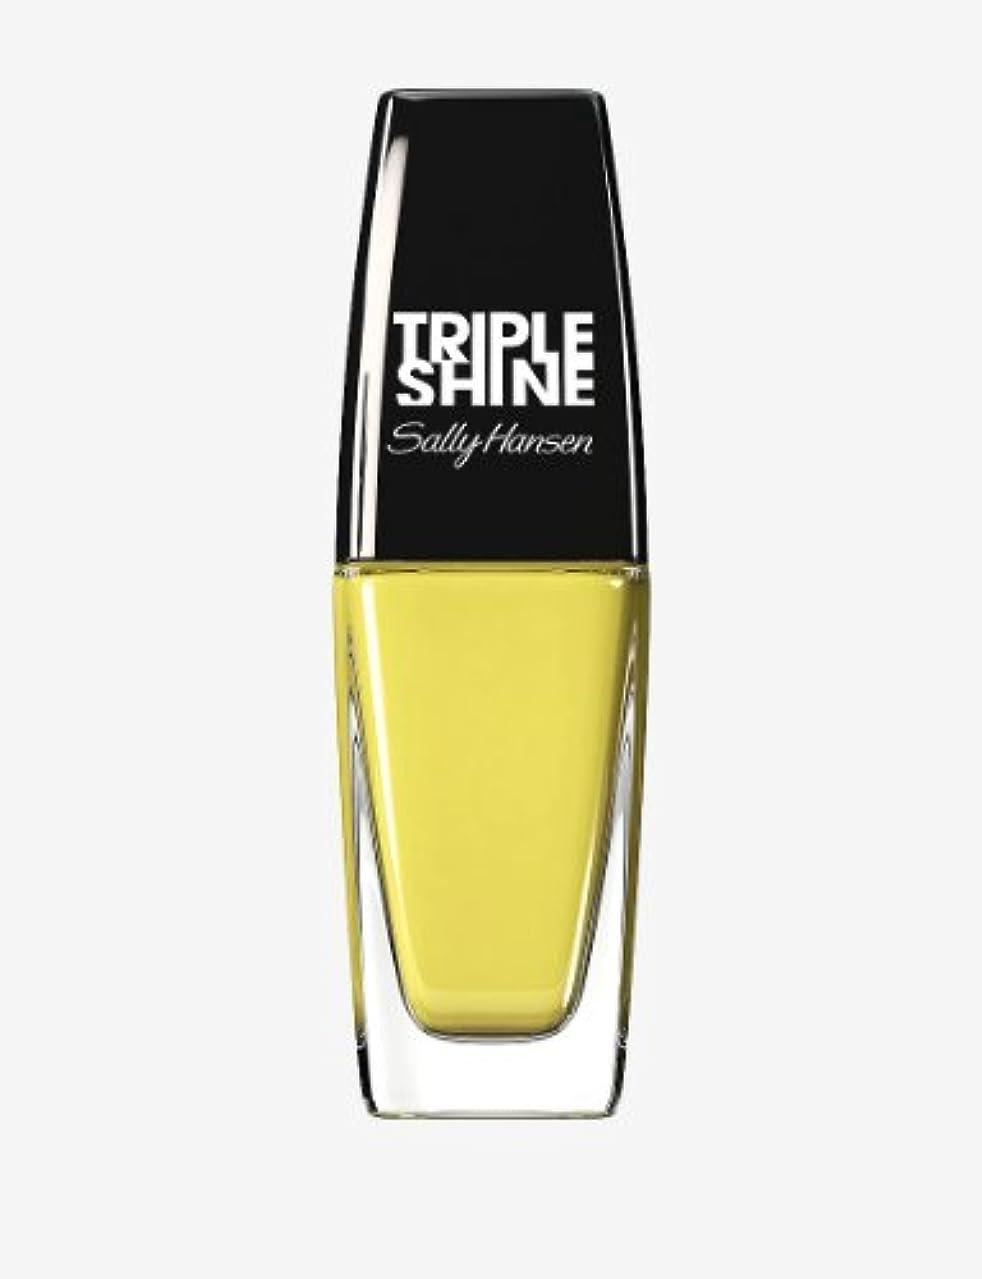 自分進行中用心SALLY HANSEN Triple Shine Nail Polish - Statemint (並行輸入品)